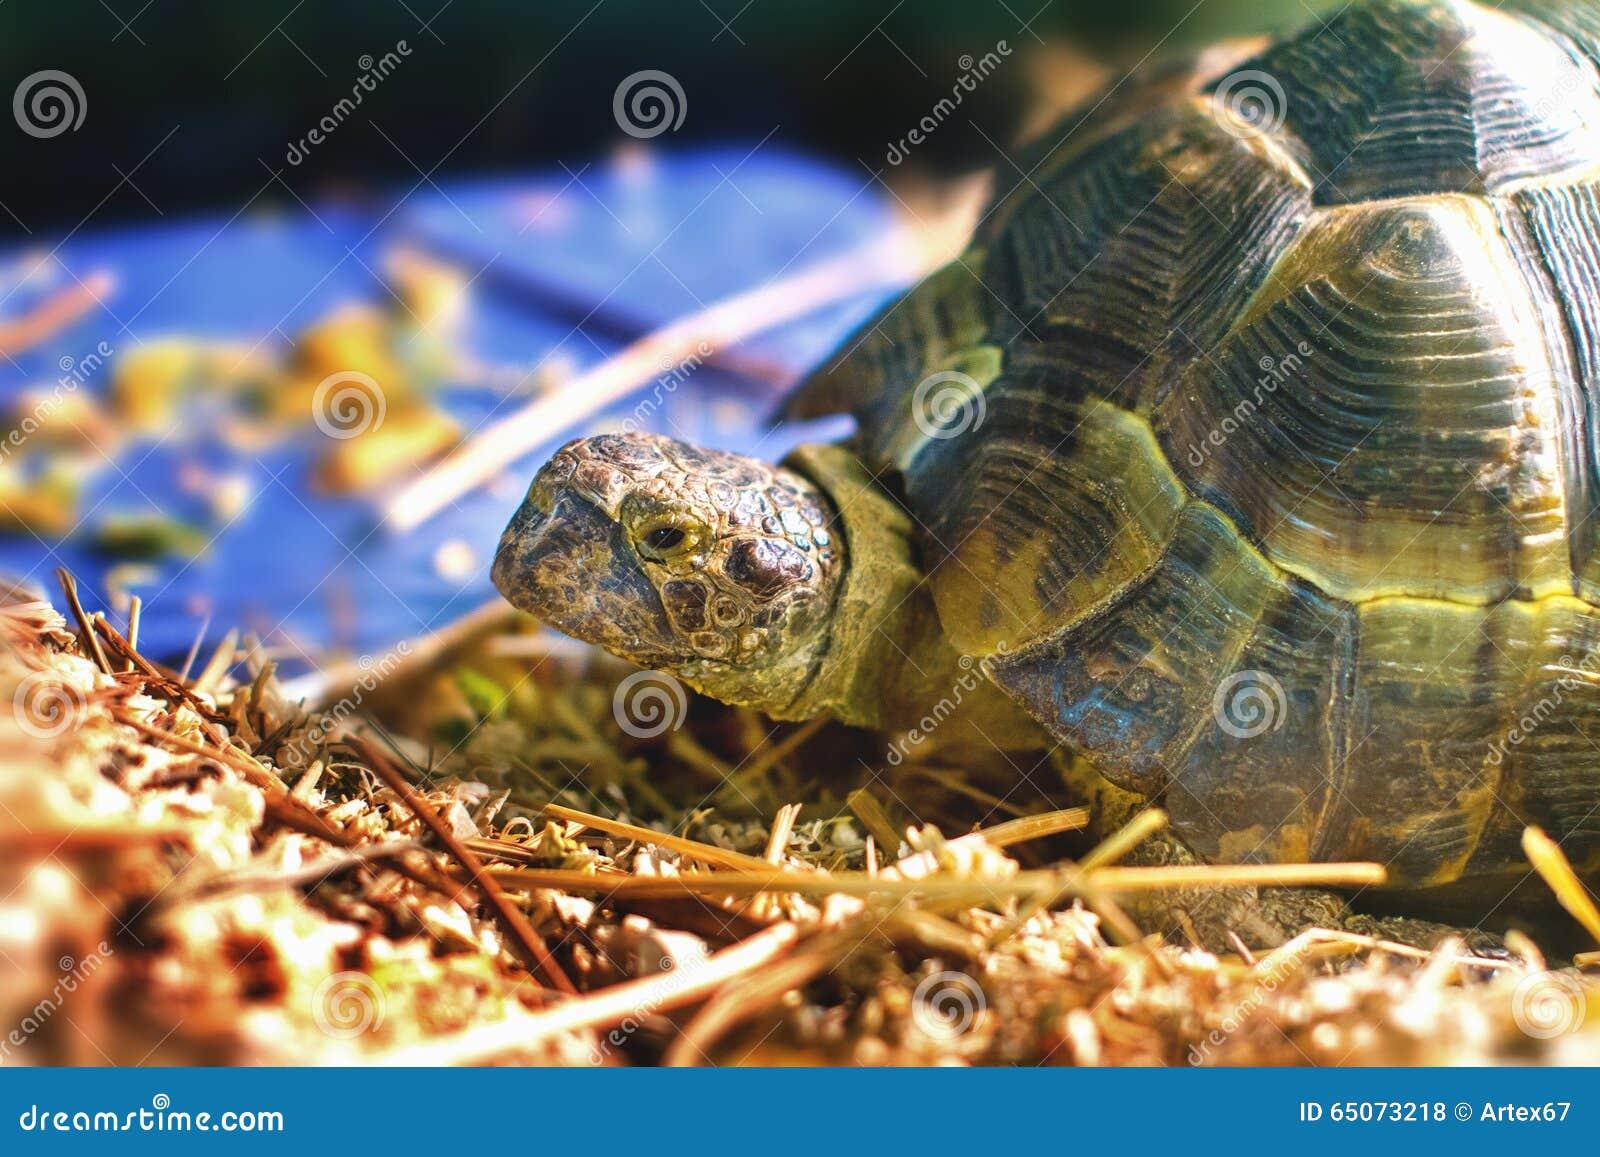 Sköldpaddan i ett akvarium klibbade hennes huvud ut ur skalet